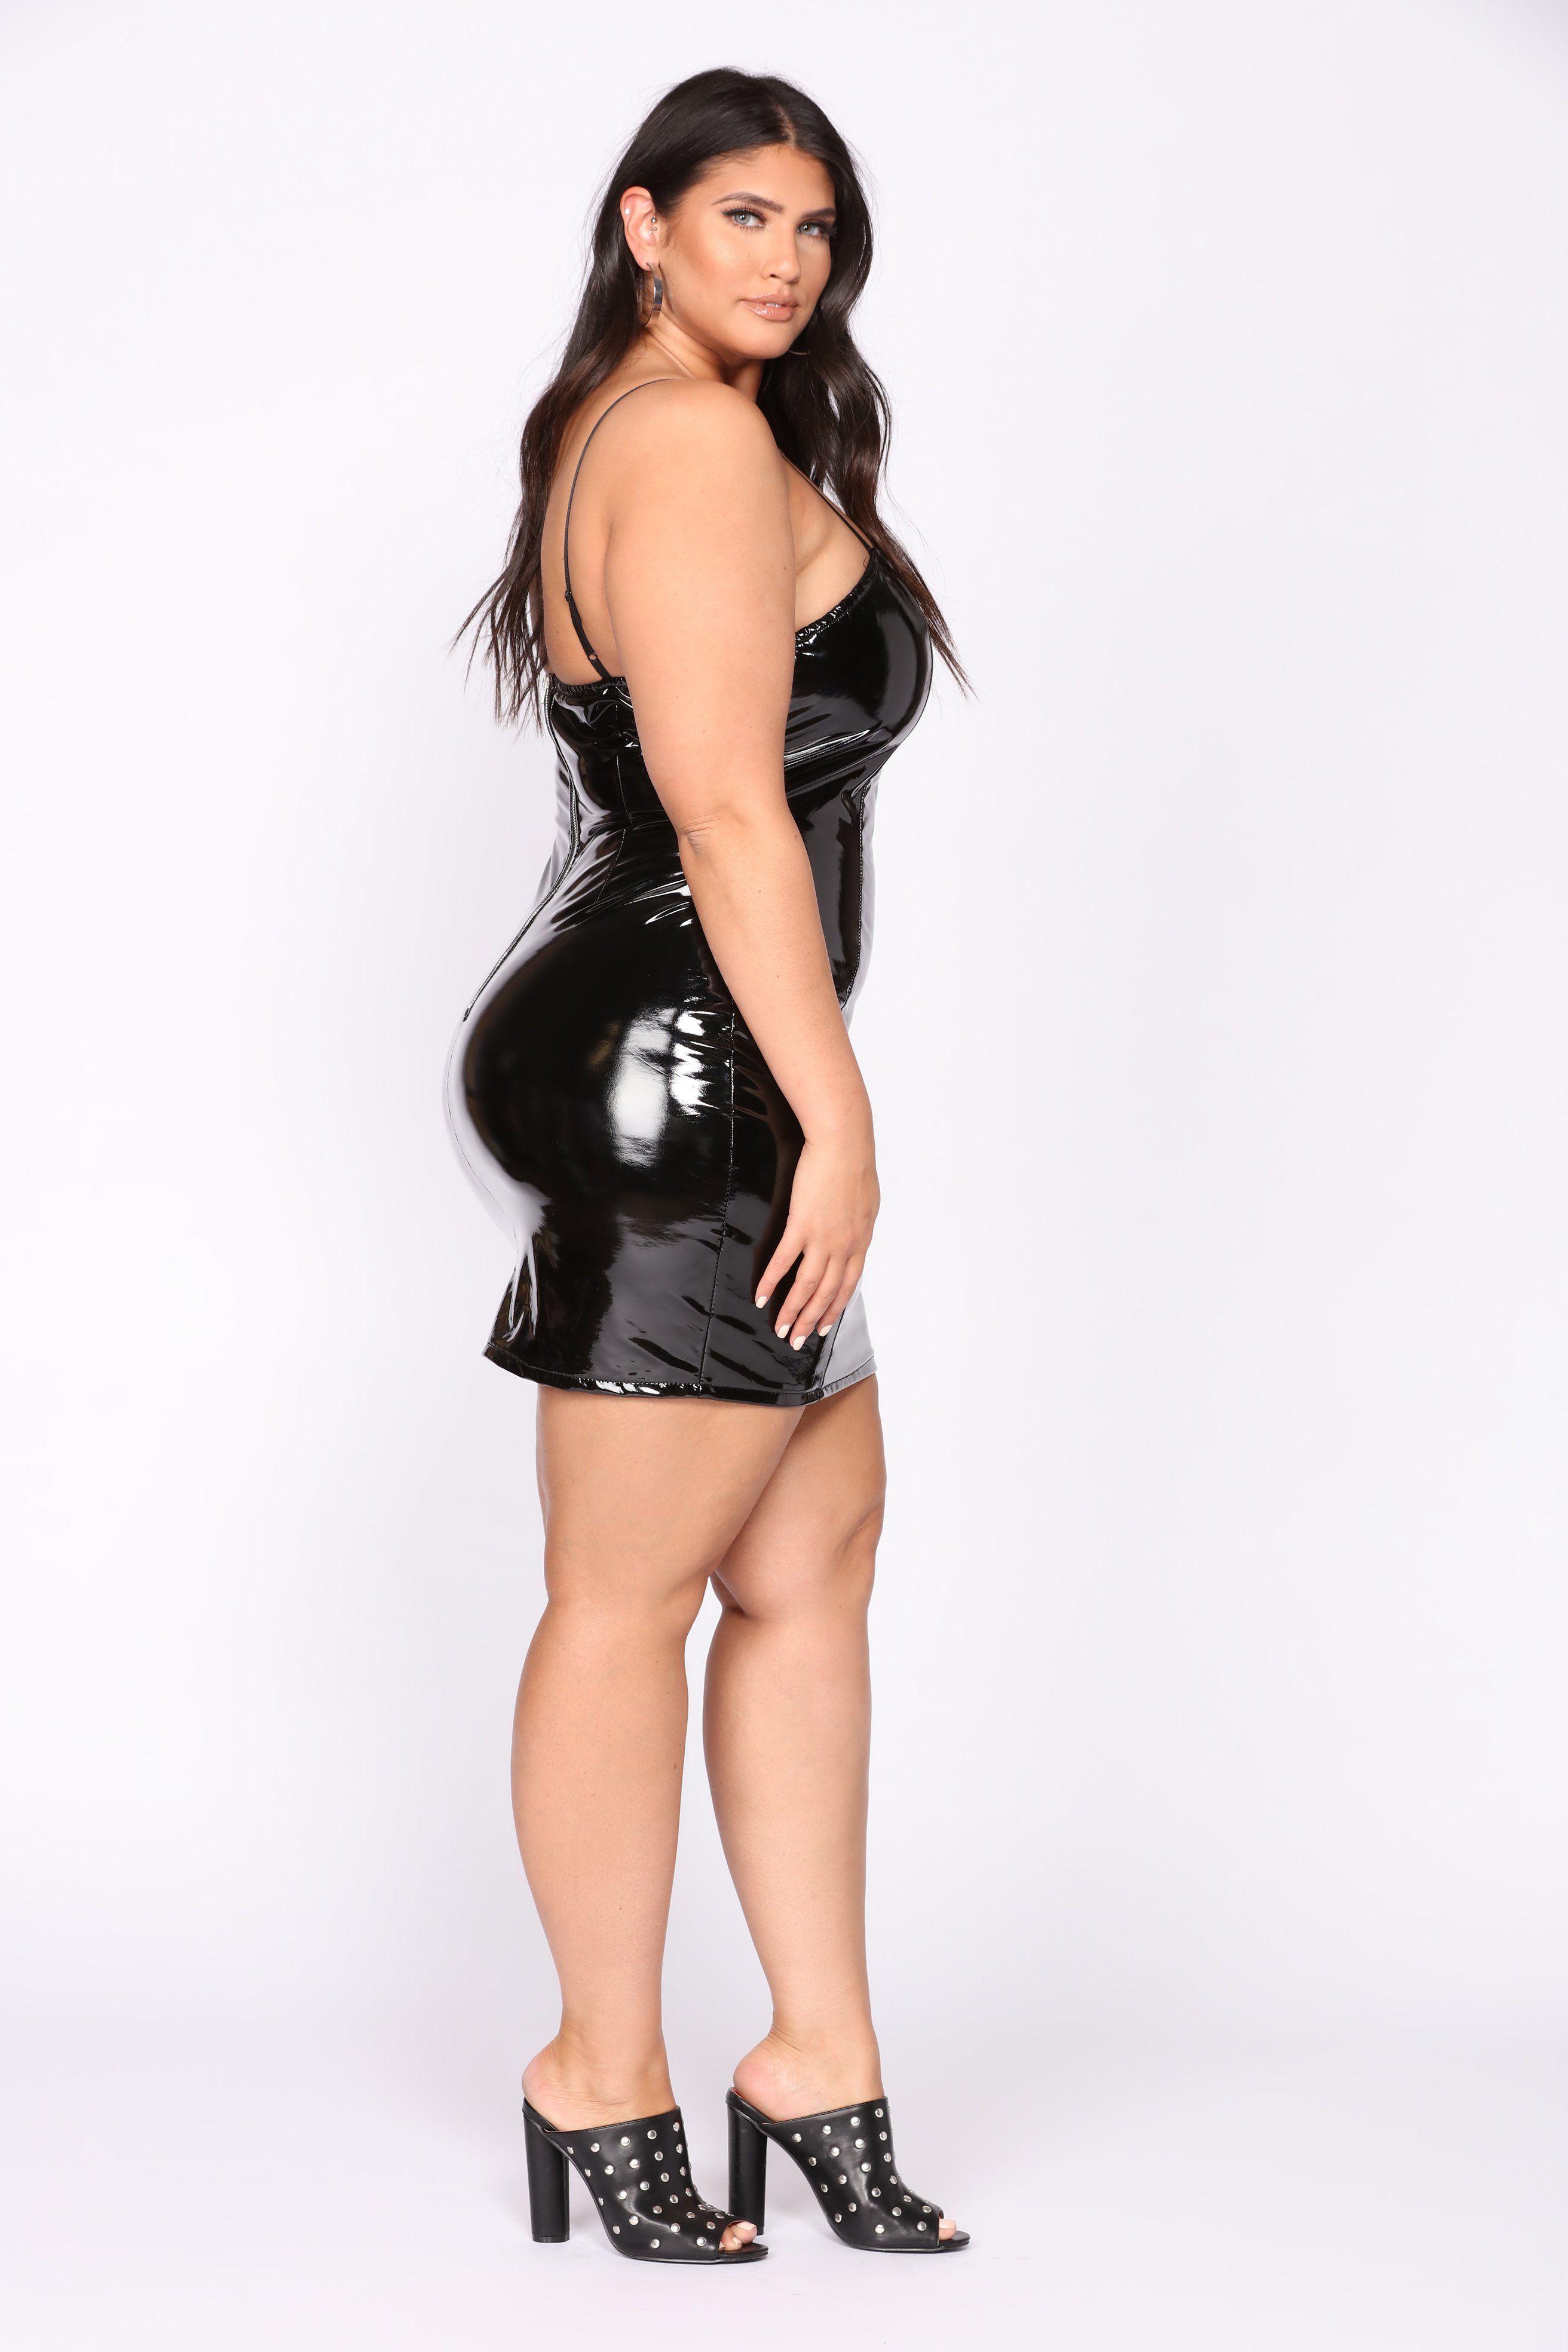 8c8b8f67ae Latecia Thomas Curvy Plus Size, Plus Size Model, Latex Dress, Voluptuous  Women,